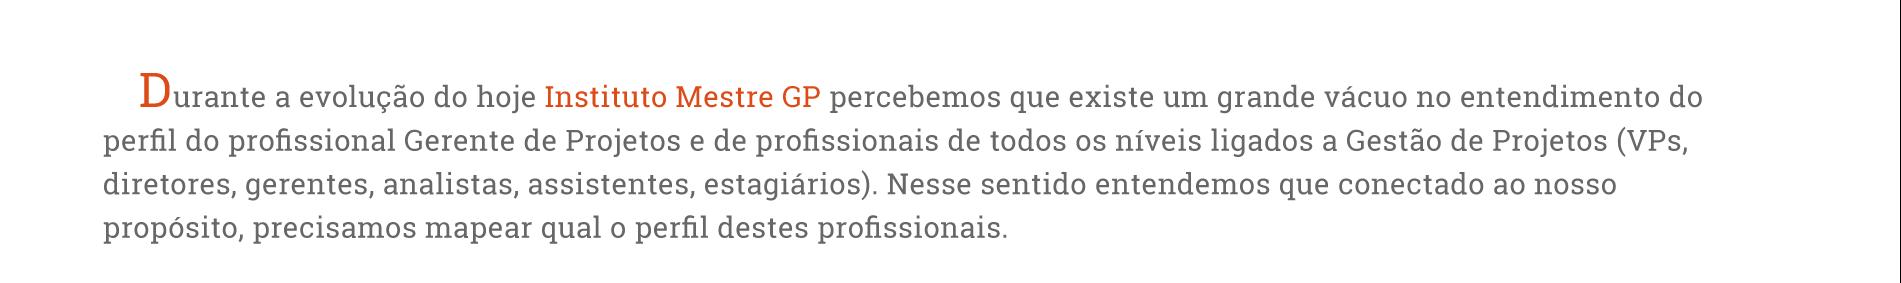 https://www.mestregp.com.br/wp-content/uploads/2019/02/Ajusta-pag-pesquisa-04-1901x283.png